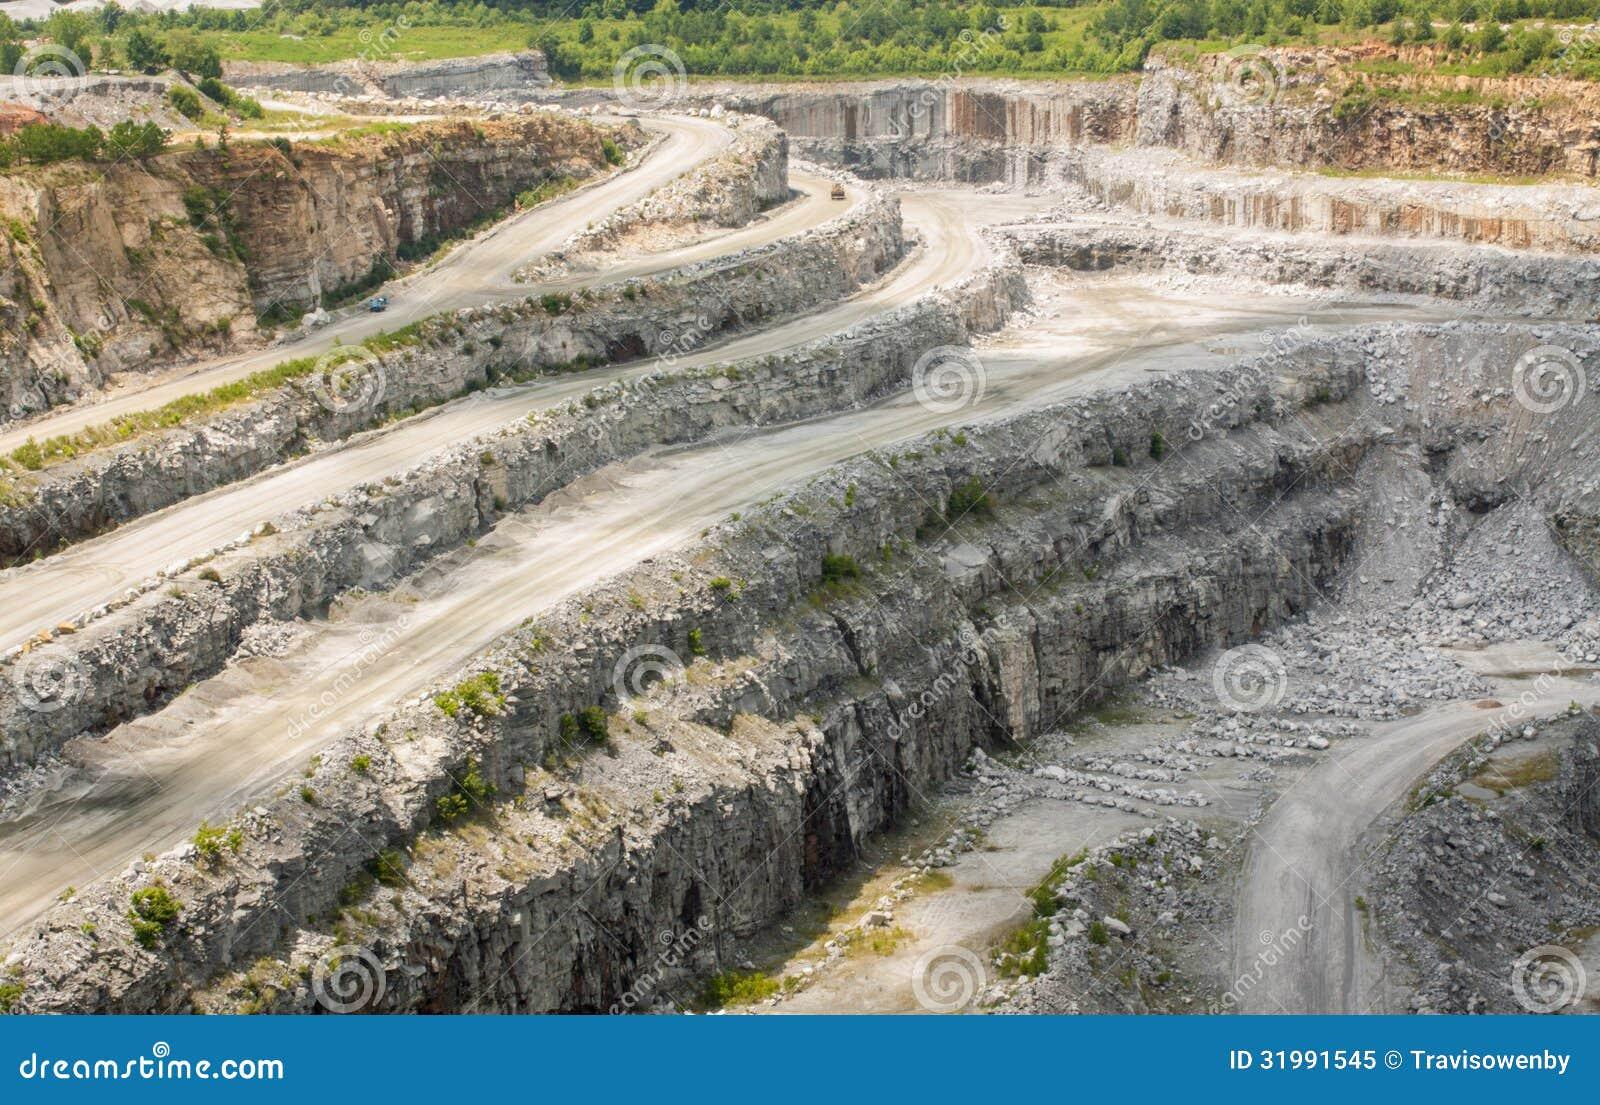 Georgia Granite Mine Royalty Free Stock Photo Image